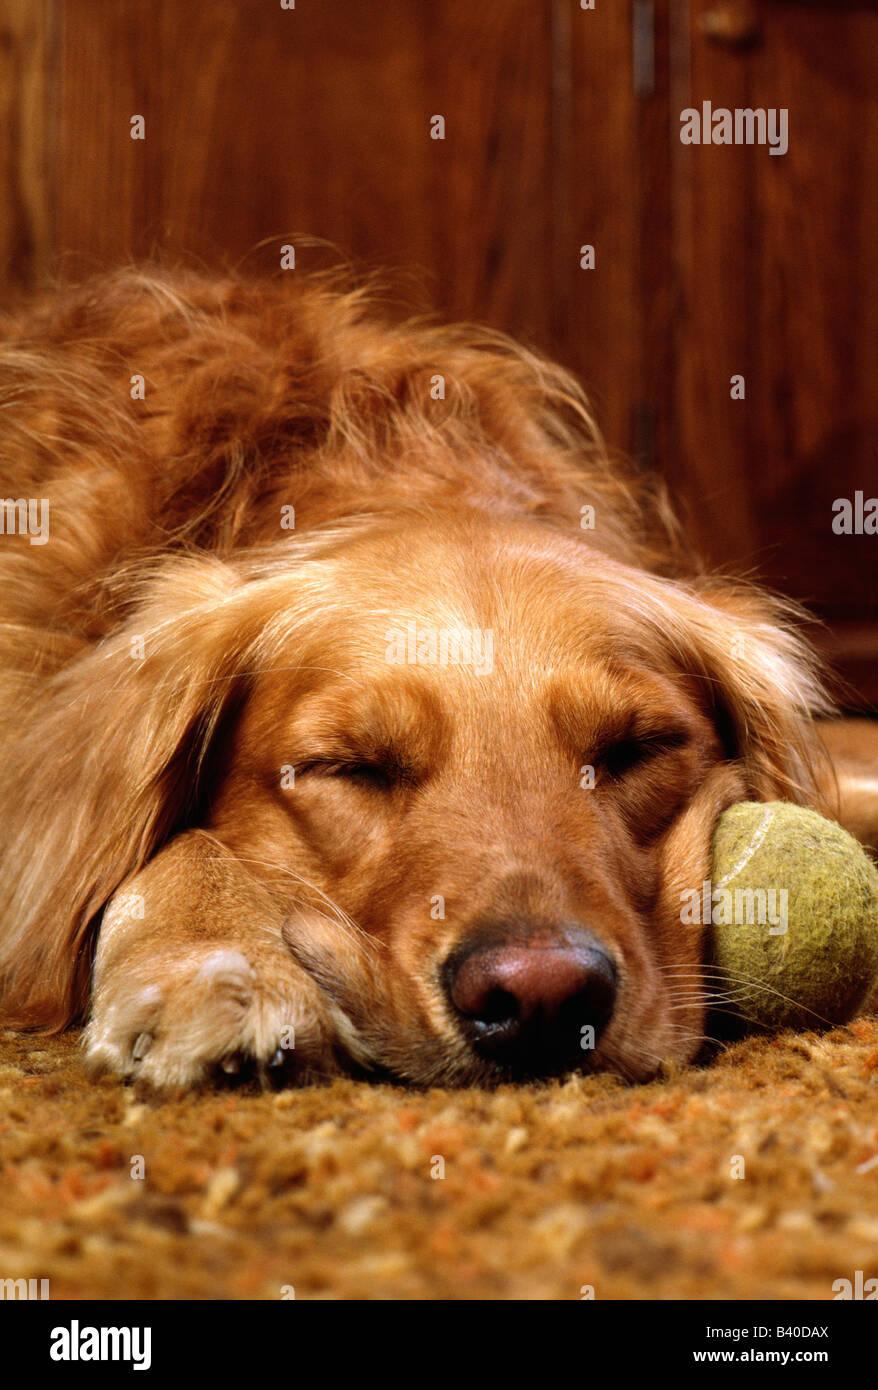 Golden Retriever dog sleeping with an old, worn, tennis ball. - Stock Image